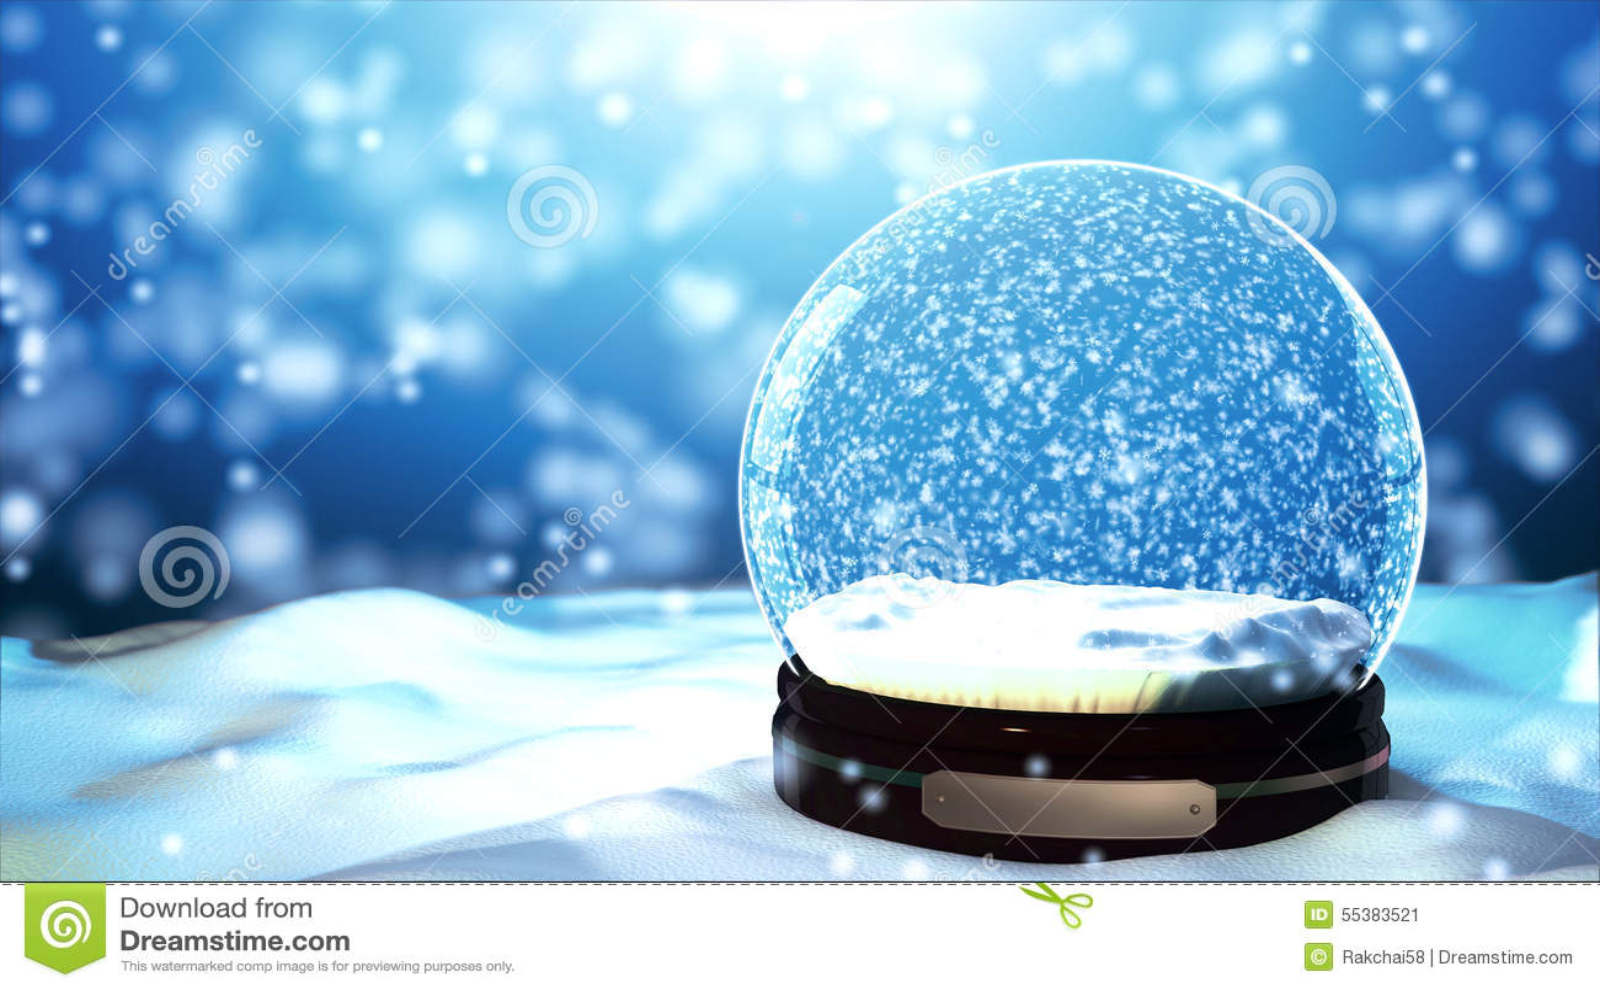 christmas snow globe snowflake with snowfall on blue christmas stocking fireplace clipart christmas stocking fireplace clipart